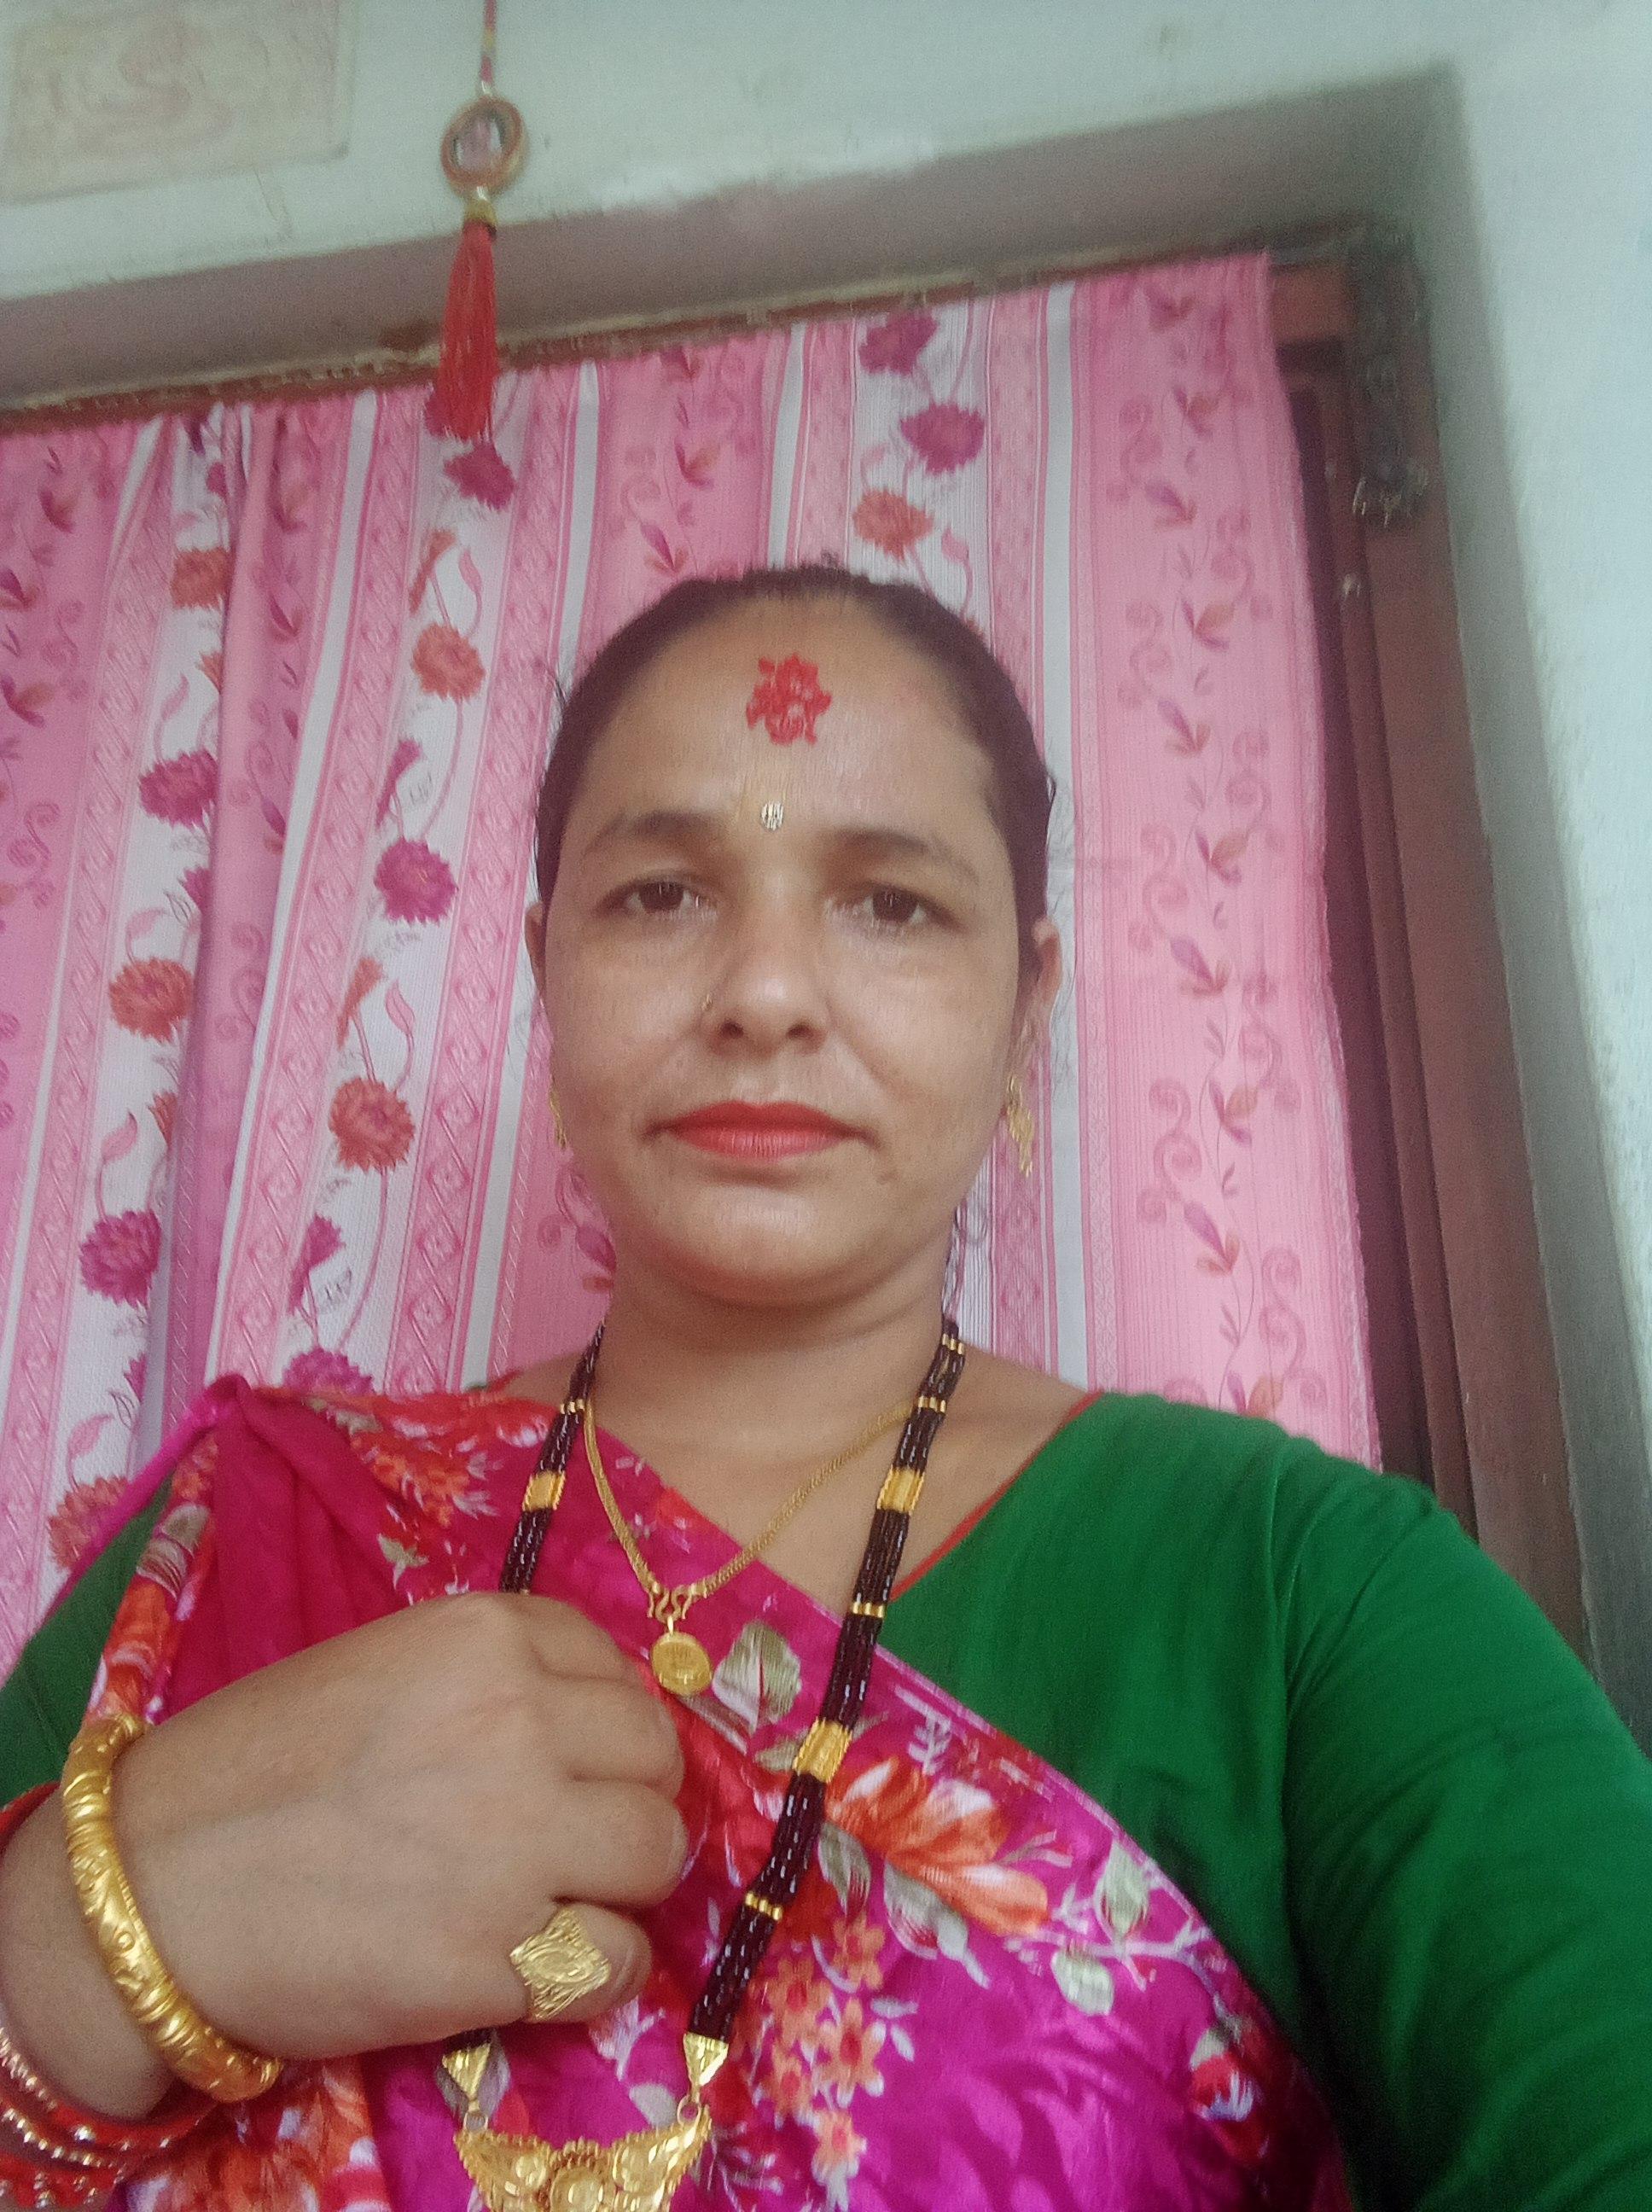 Tika Devi Thapa